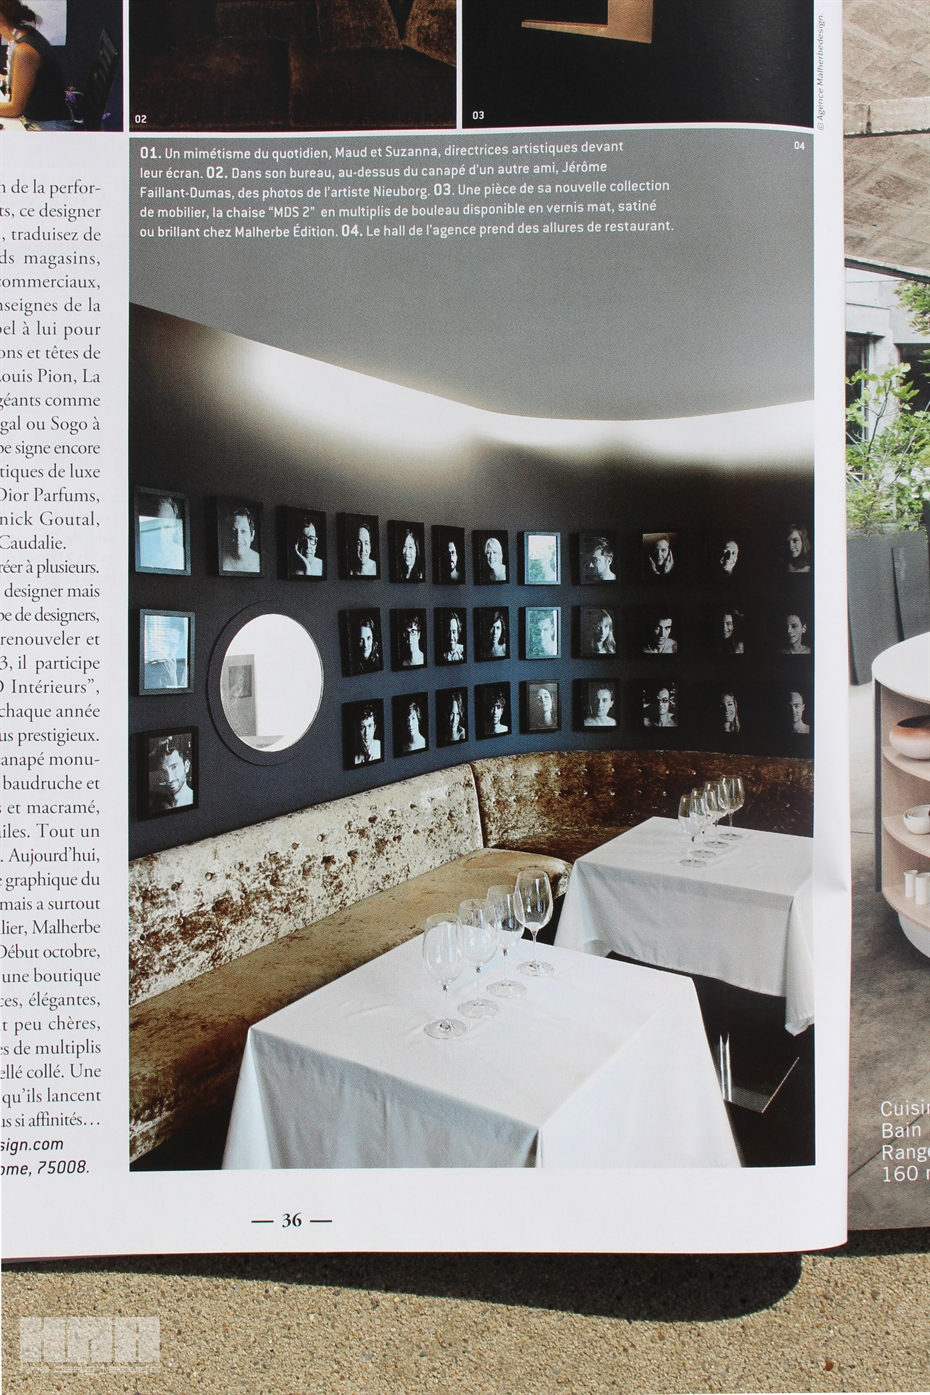 hna design inspiralo magazinok paris 3